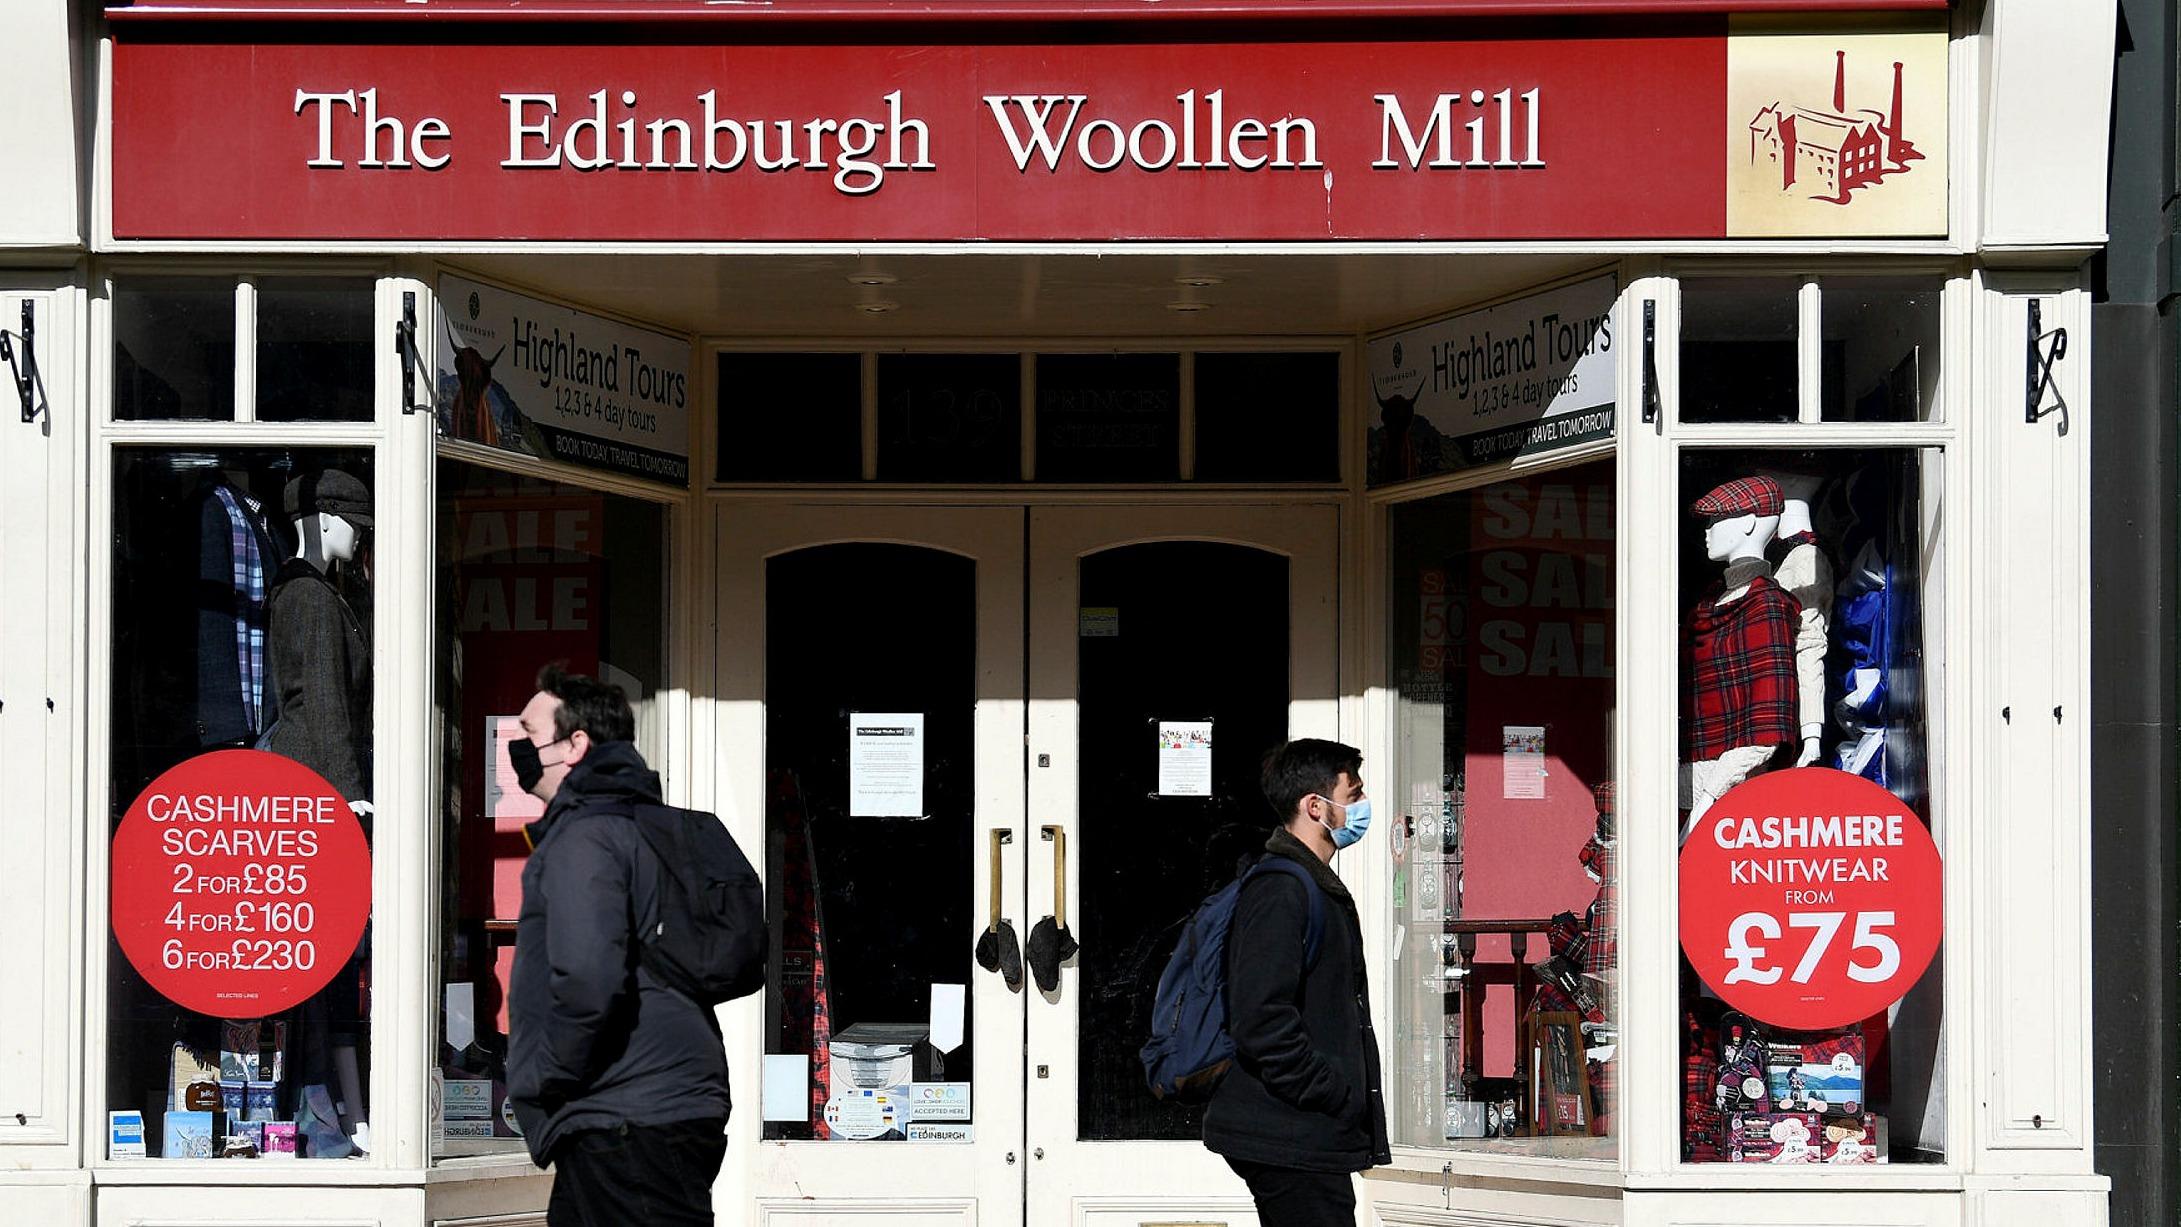 Edinburgh Woollen Mill Enters Administration Financial Times